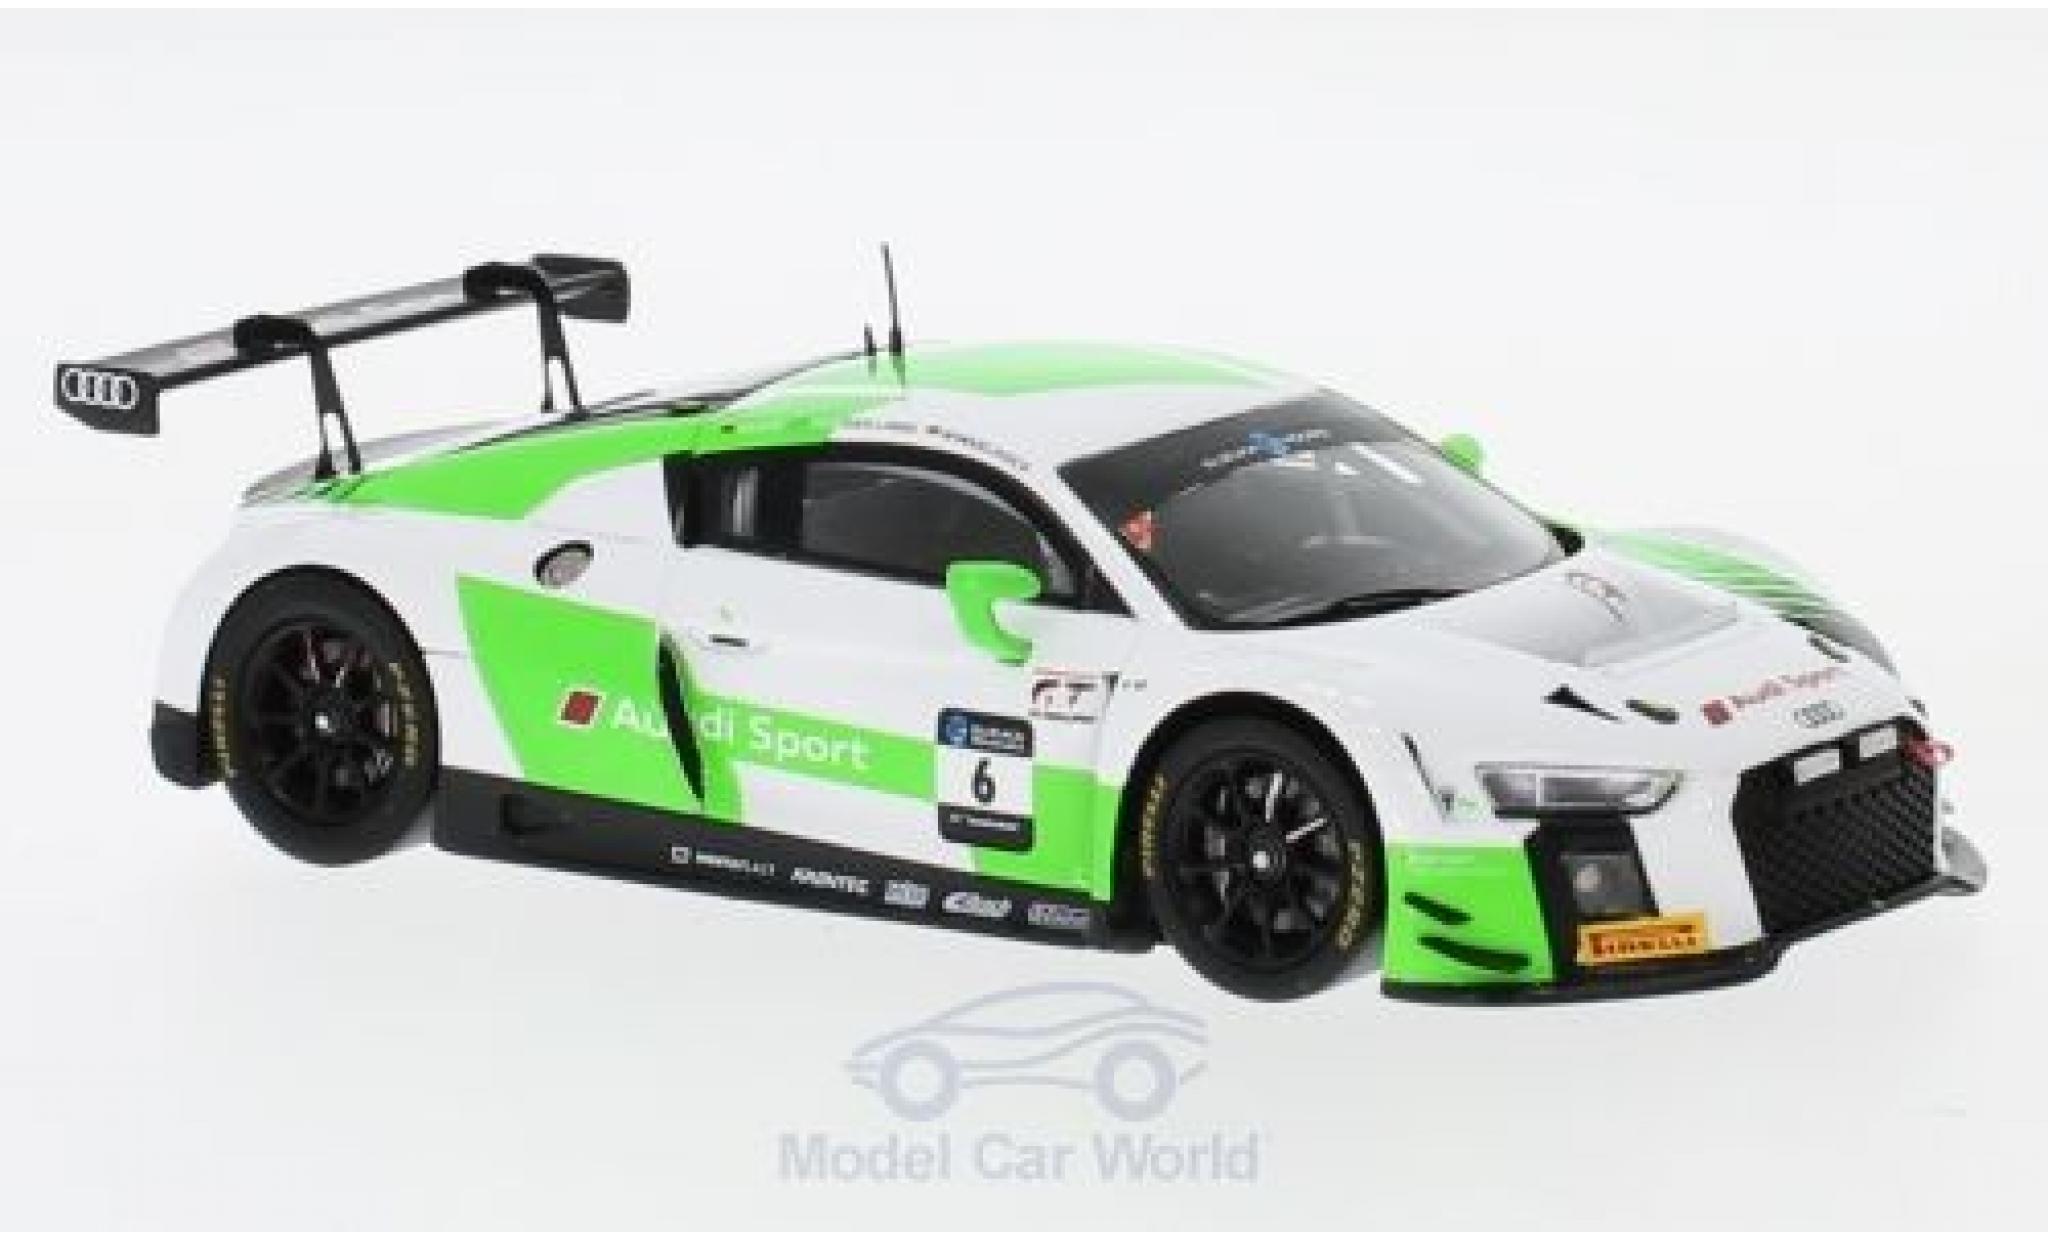 Audi R8 1/43 Spark LMS No.6 Sport Team Absolute Racing 10H Suzuka 2018 C.Haase/M.Winkelhock/K.van der Linde